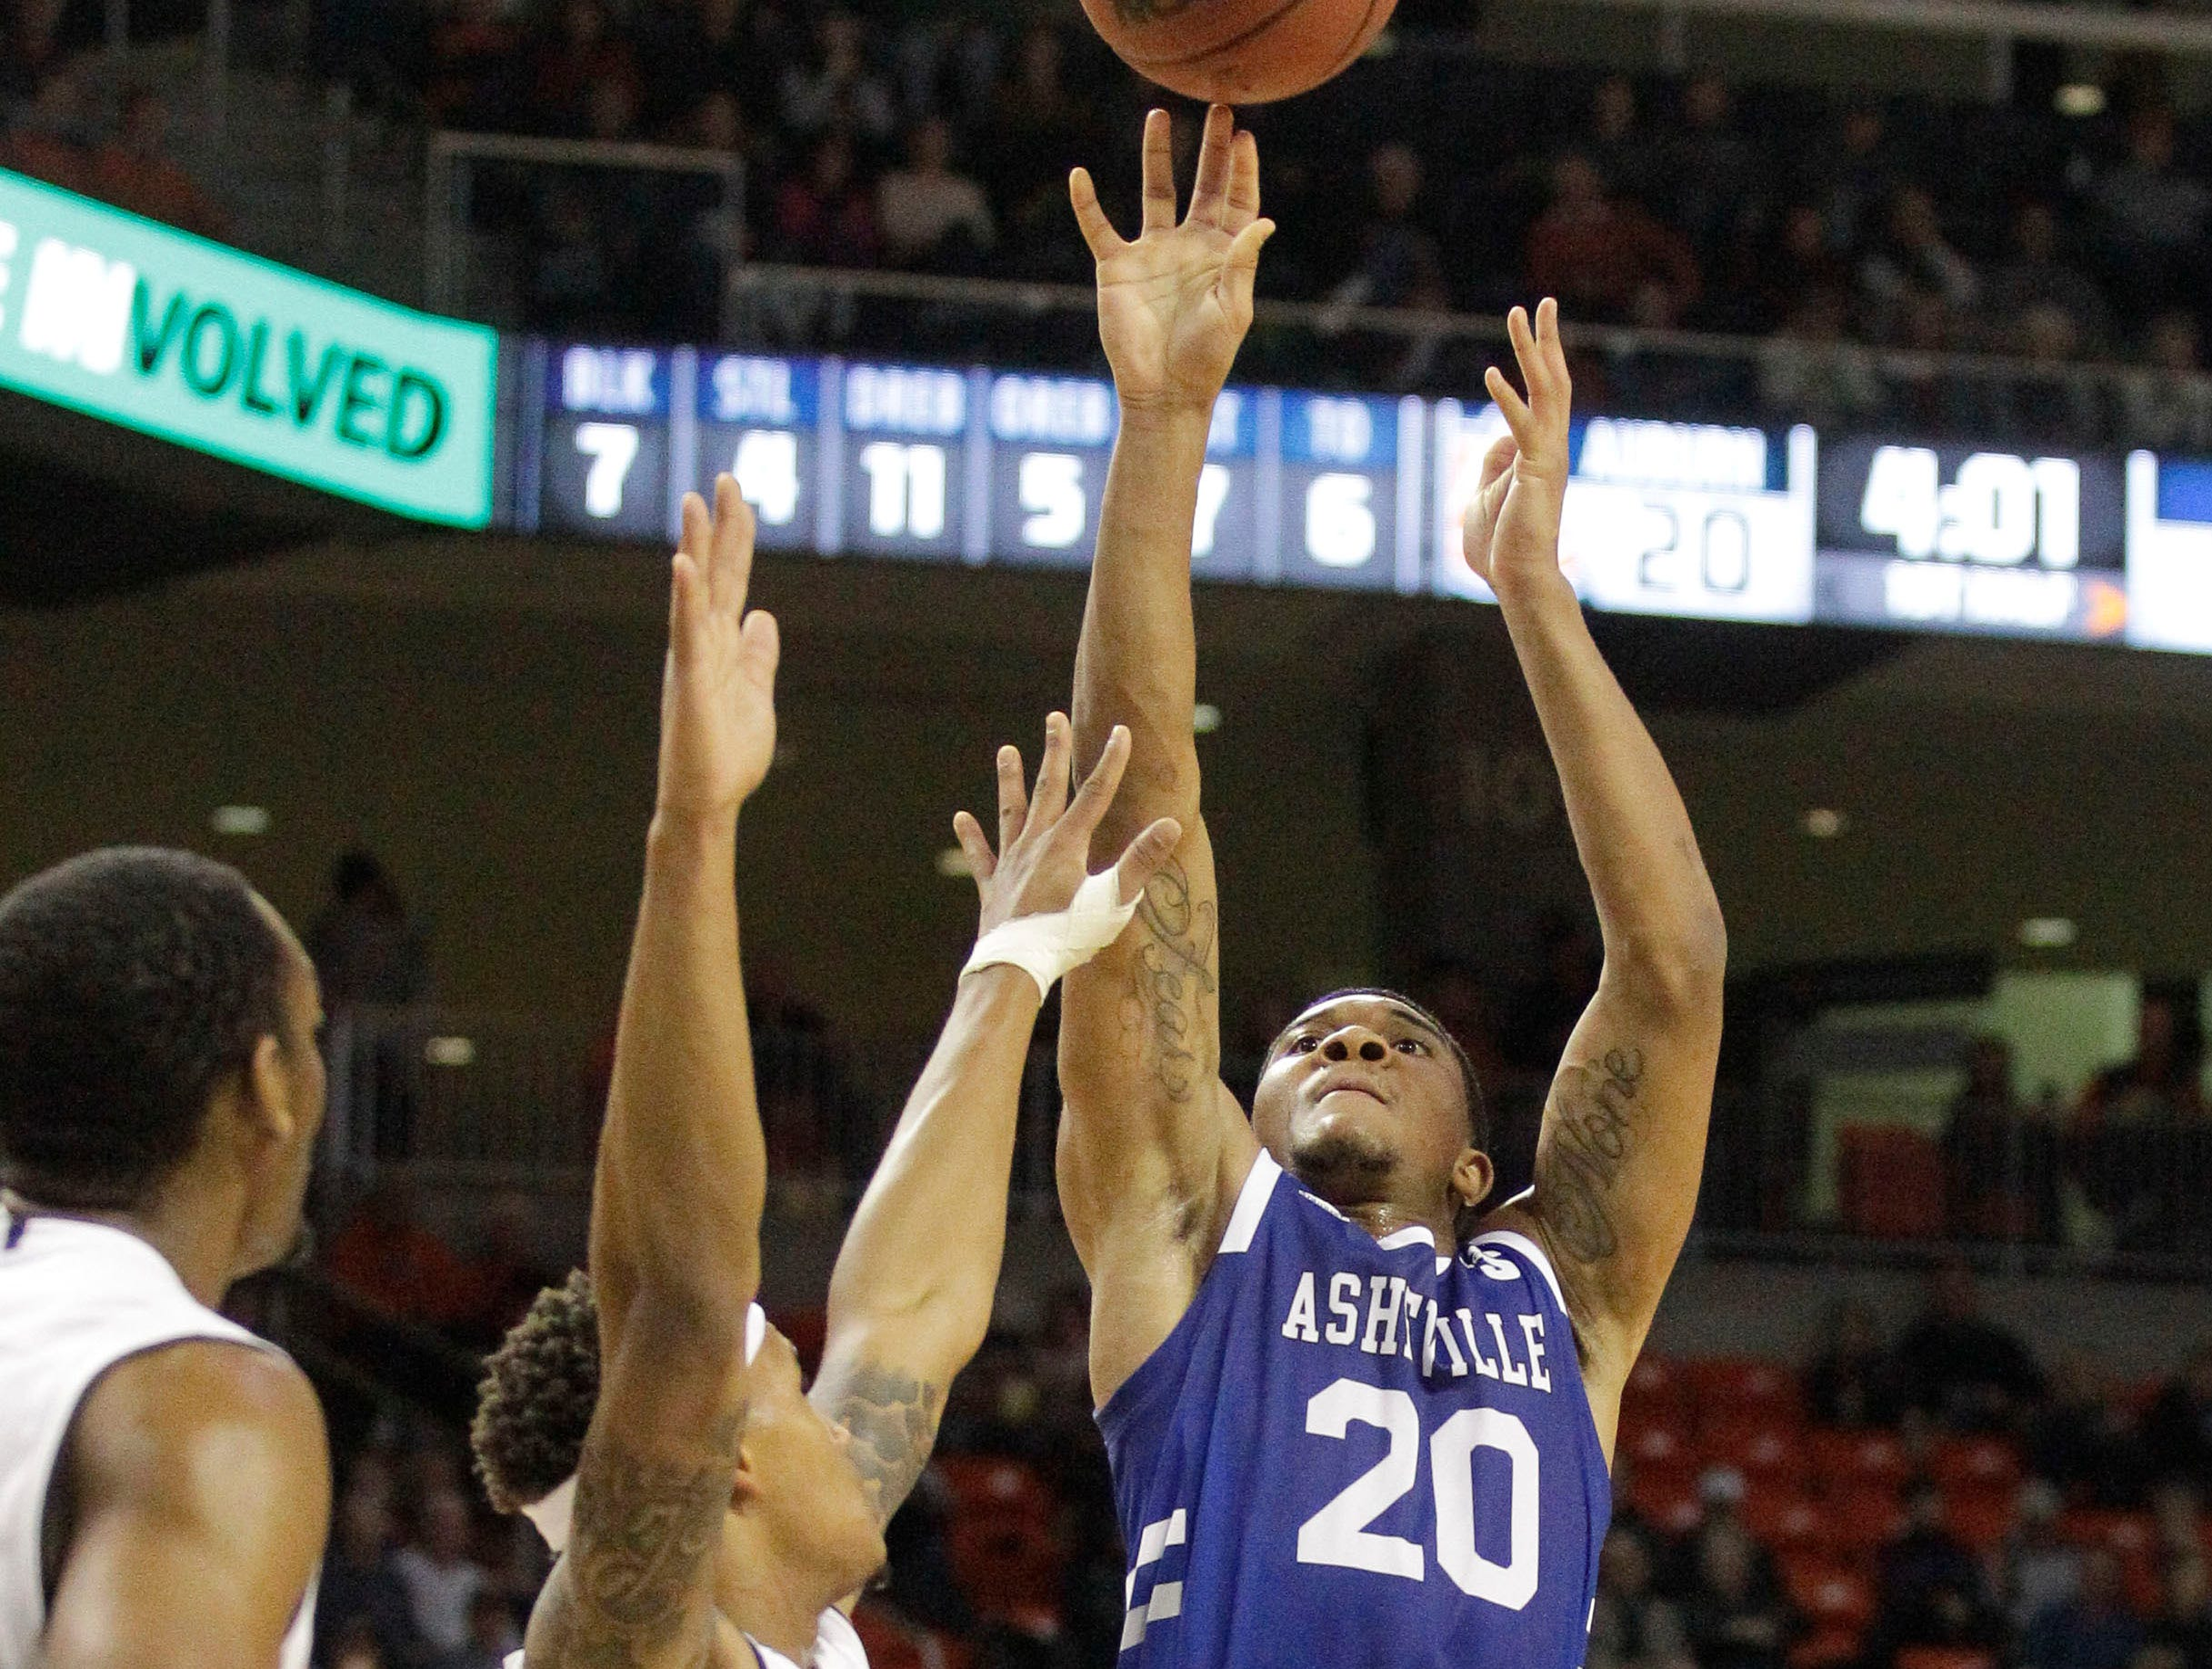 Dec 4, 2018; Auburn, AL, USA; UNC-Asheville Bulldogs guard DeVon Baker (20) shoots over Auburn Tigers guard Bryce Brown (2) during the first half at Auburn Arena. Mandatory Credit: John Reed-USA TODAY Sports